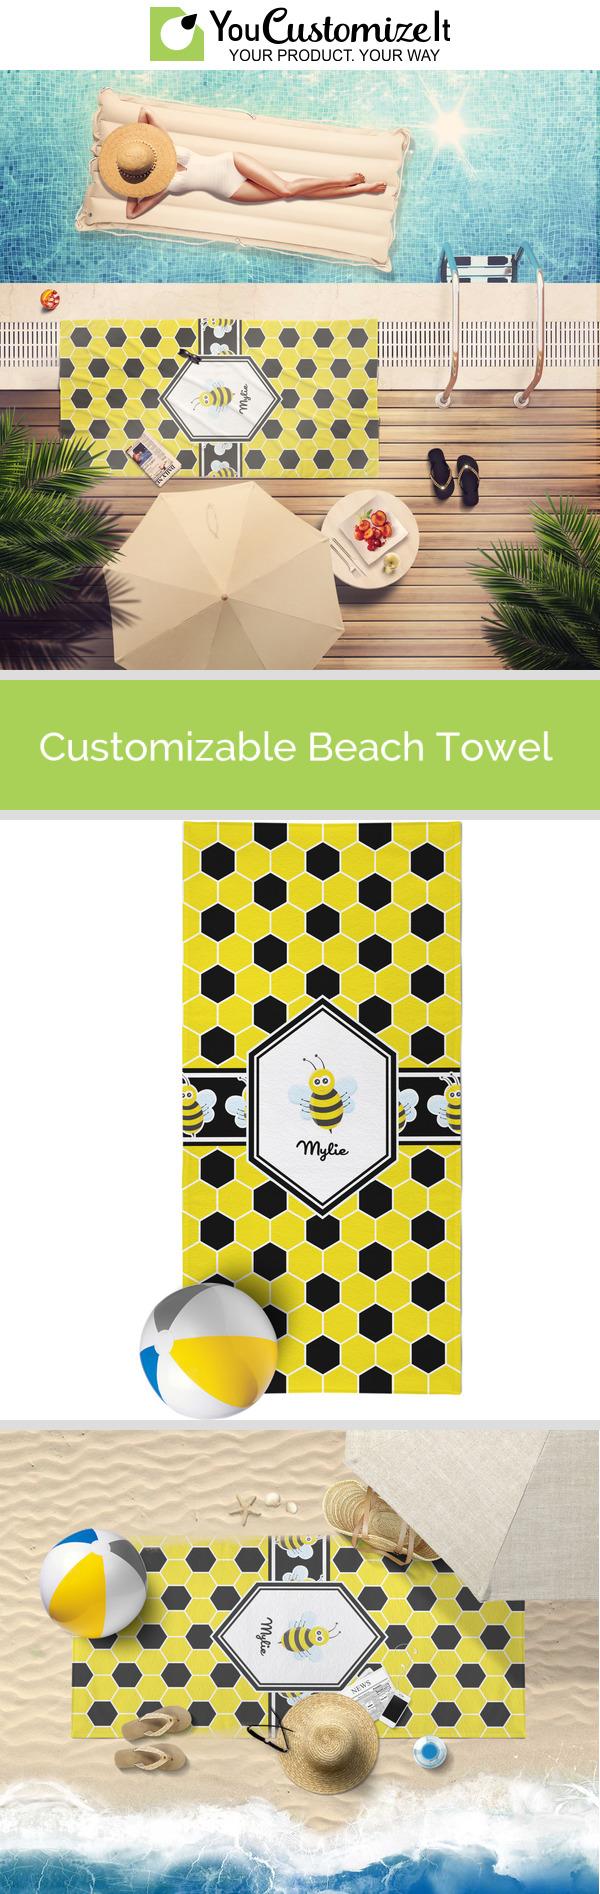 YouCustomizeIt Honeycomb Sheer Sarong Yellow Personalized